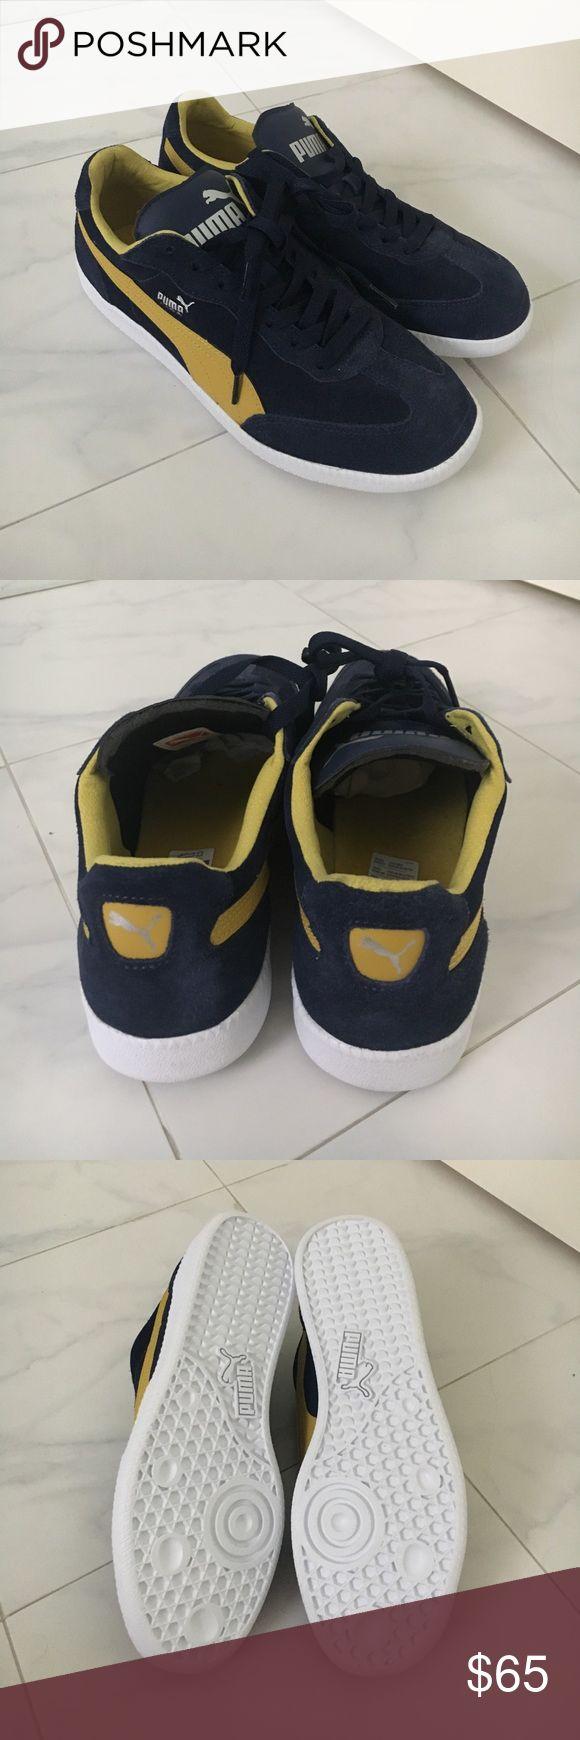 NWOB RARE!! navy/yellow Puma Liga NWOB navy/yellow Puma Liga. Never worn. Classic puma style. Comes from a smoke/pet free home. Puma Shoes Sneakers